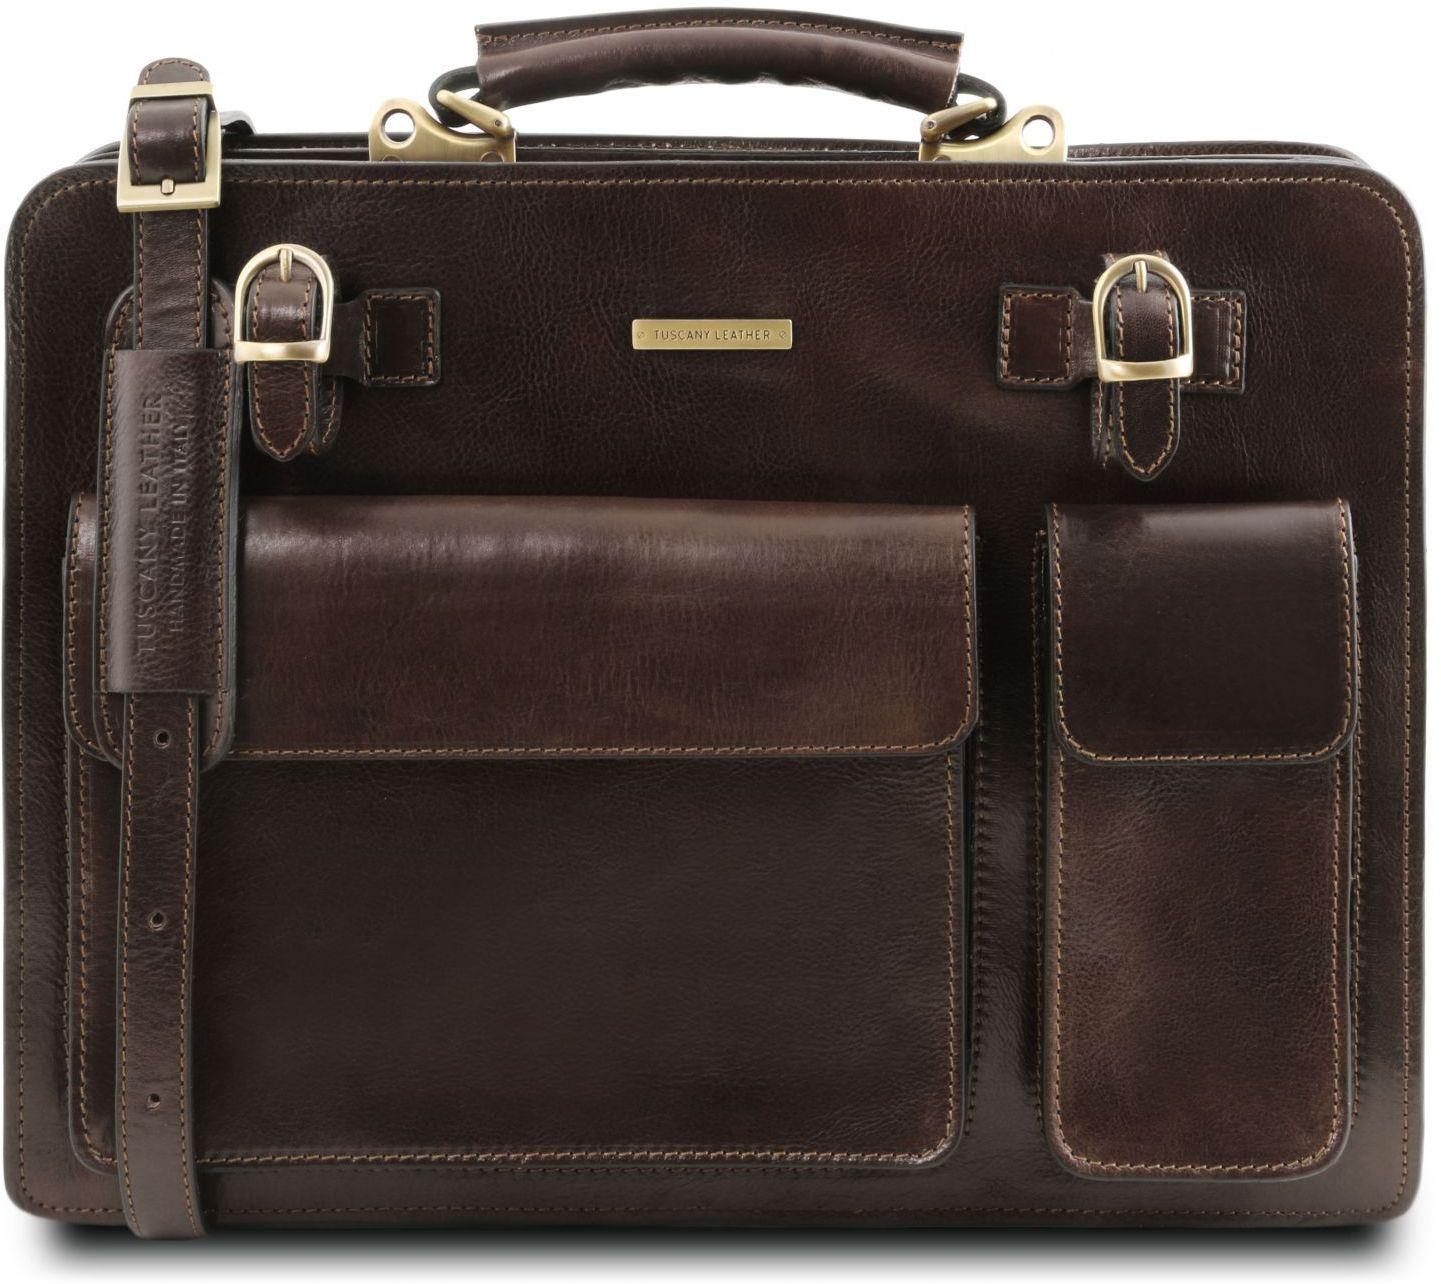 cc34a1ec23 Επαγγελματική Τσάντα Δερμάτινη Venezia Καφέ σκούρο Tuscany Leather ...